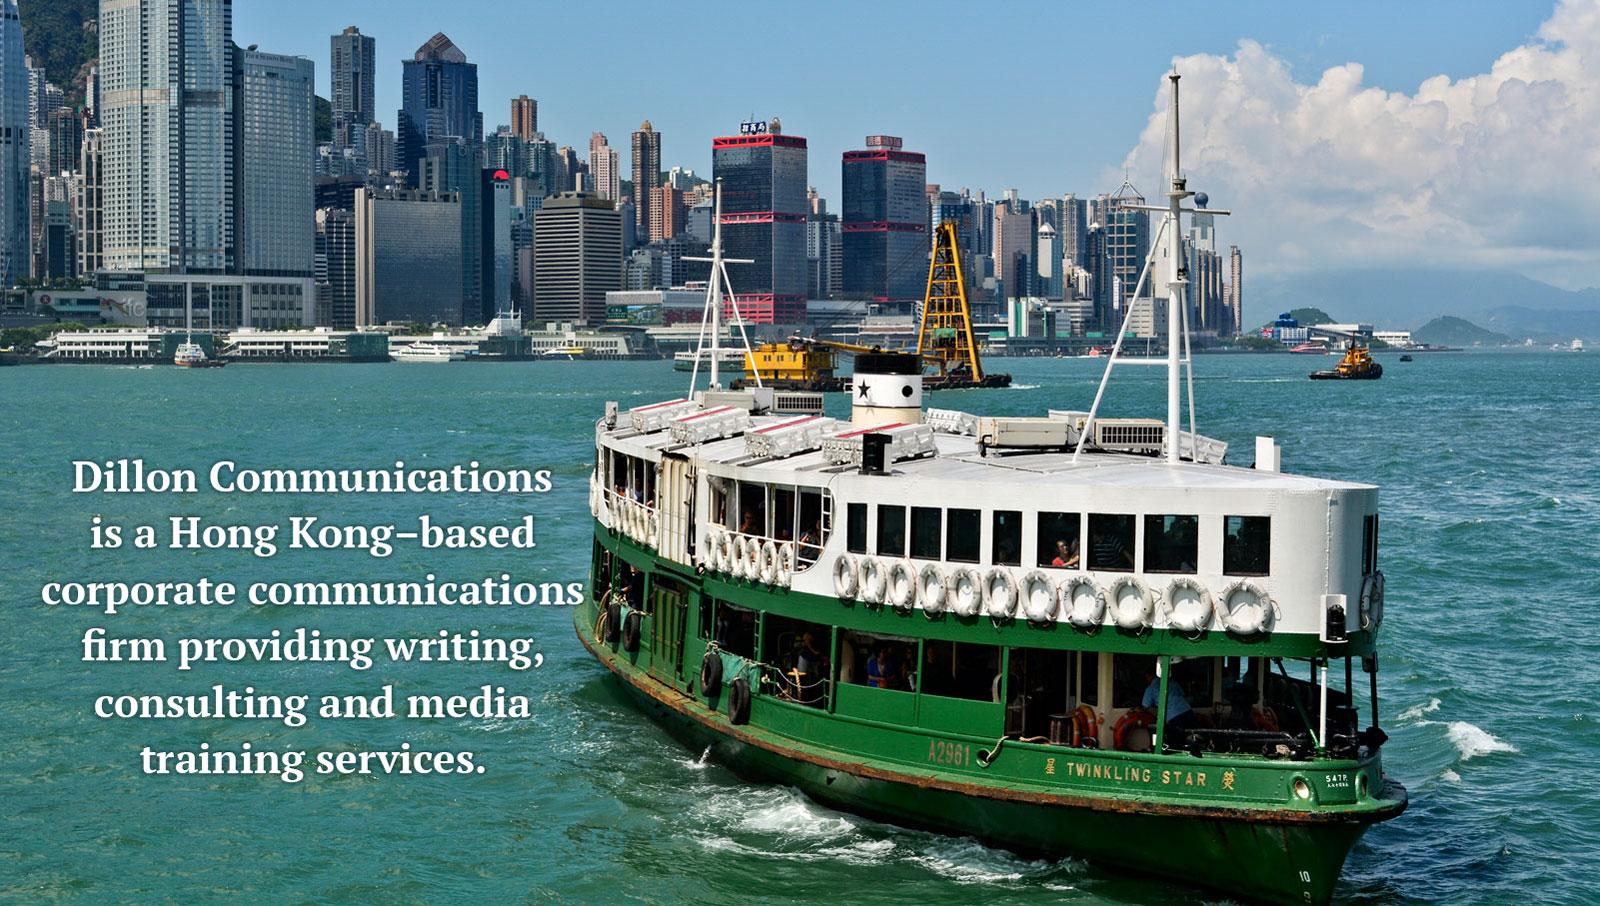 Dillon Communications is a Hong Kong-based corporate communications company